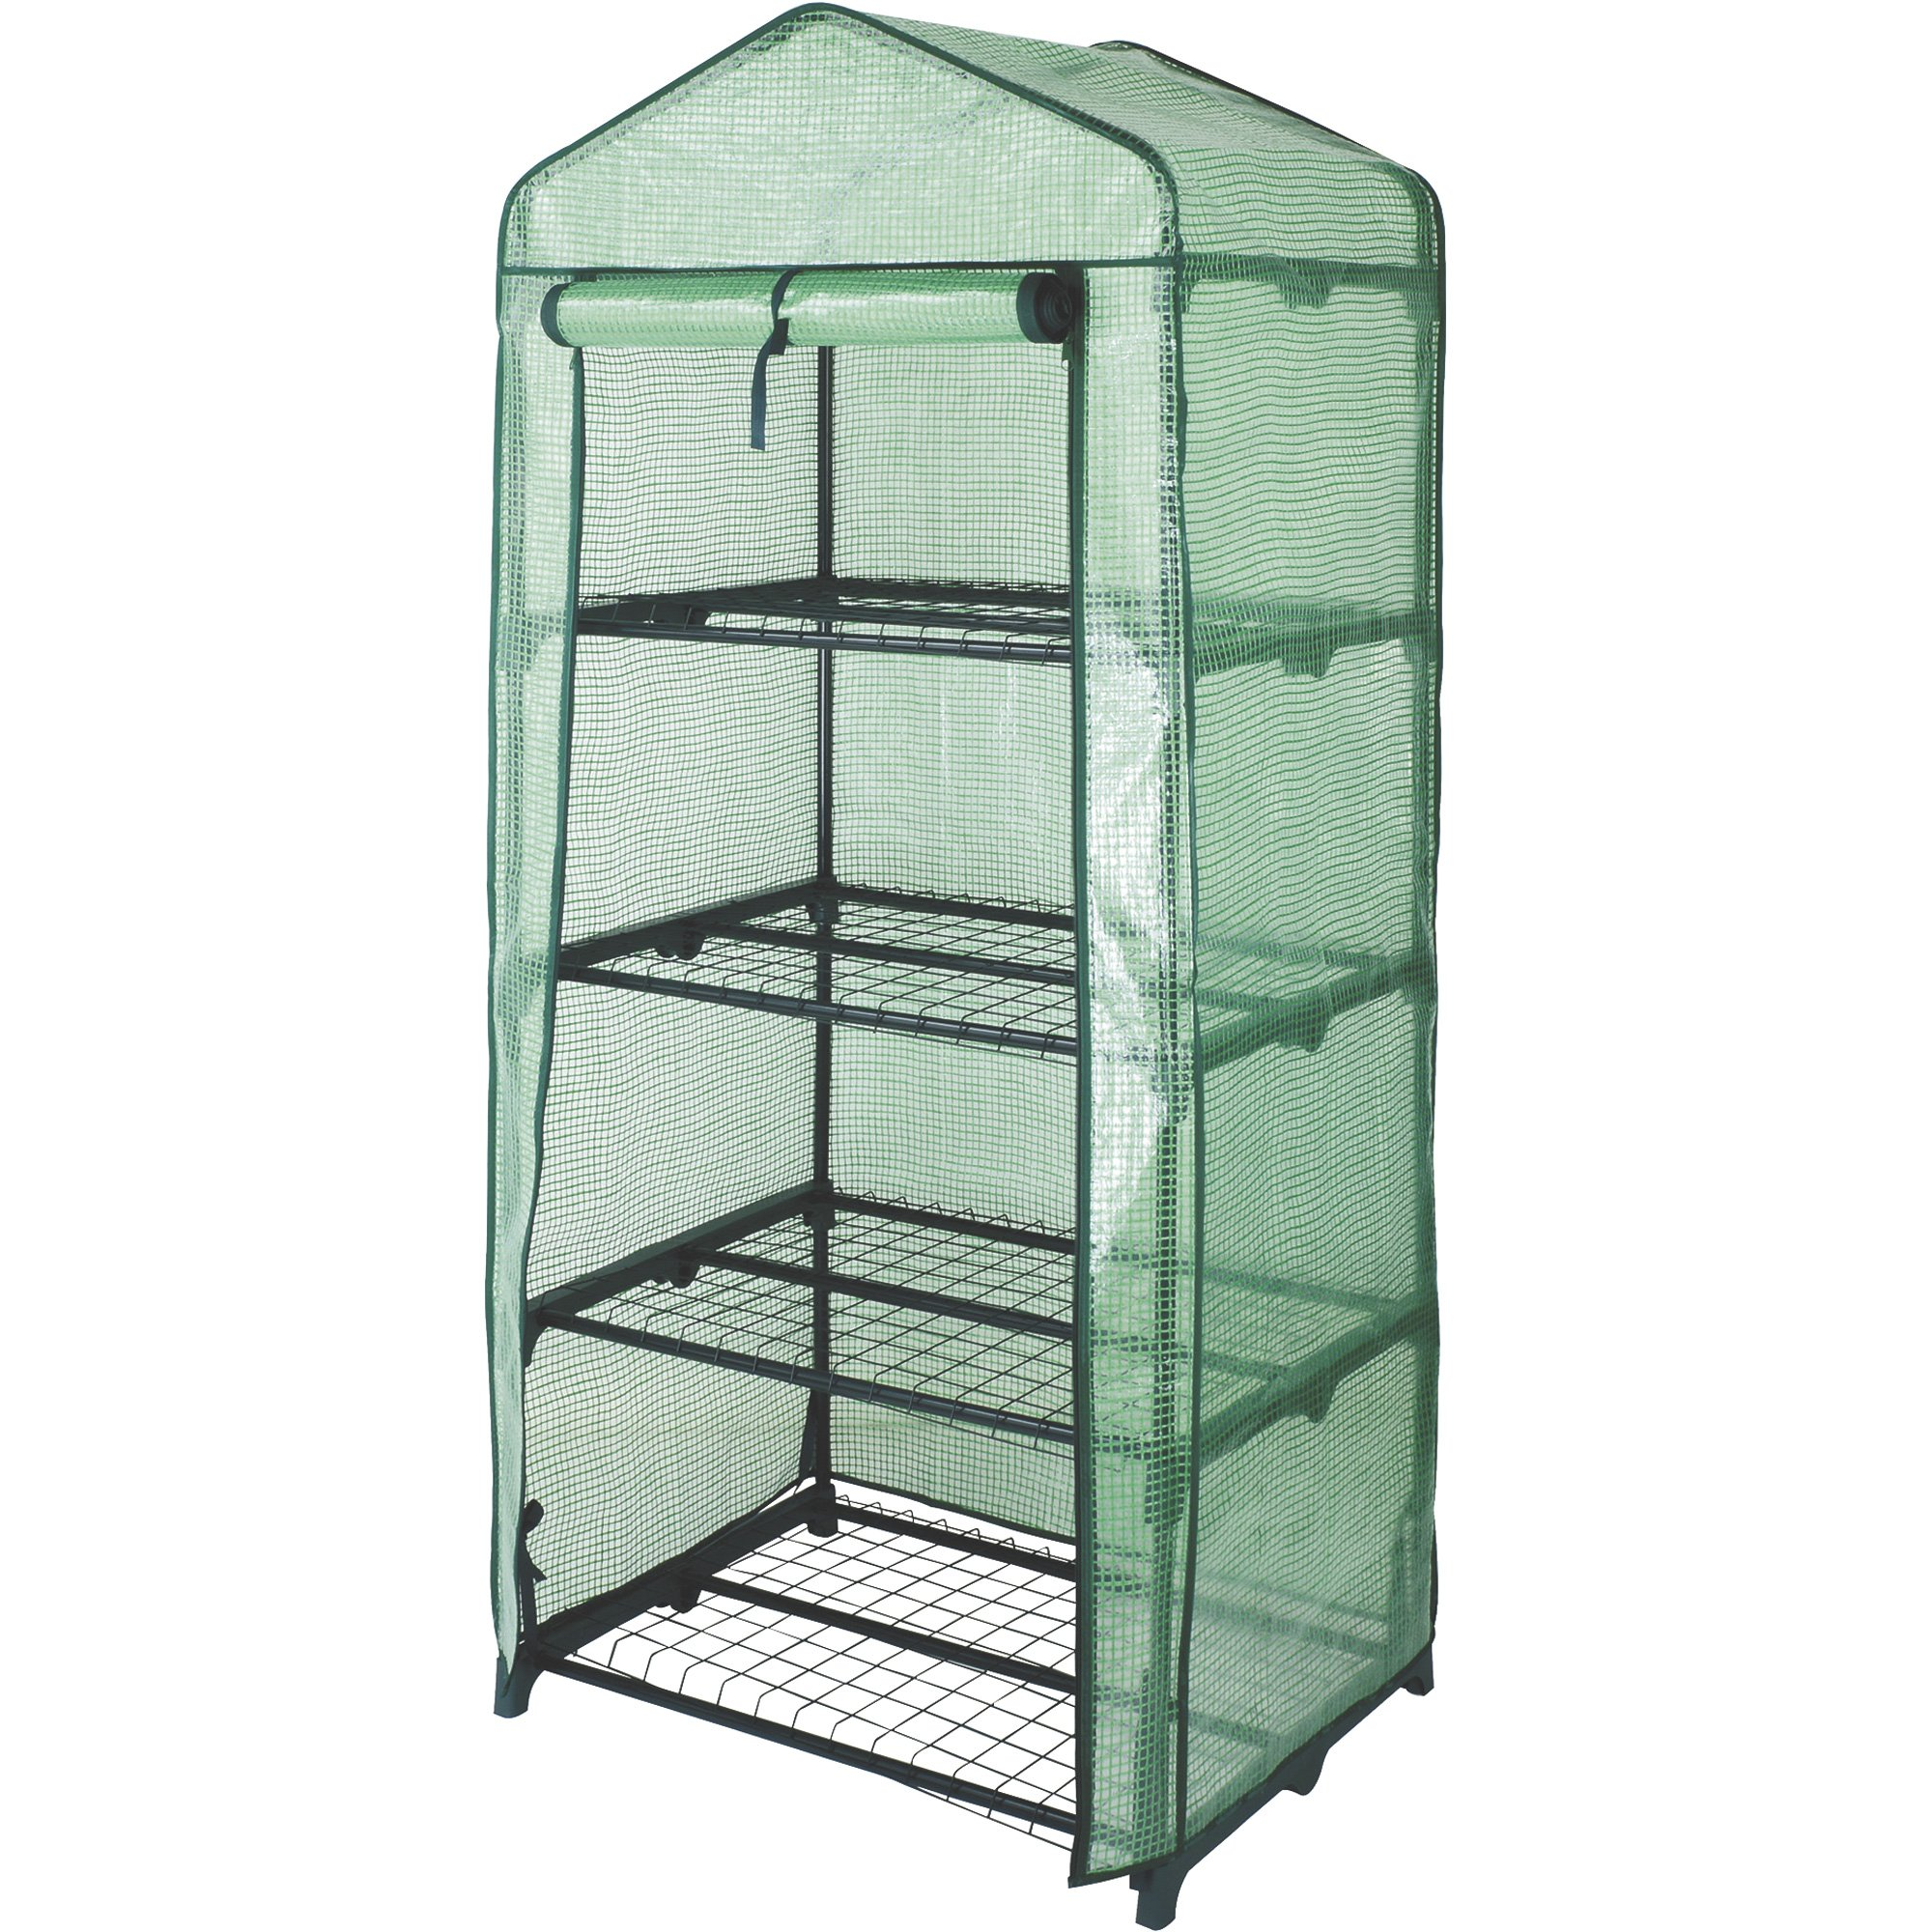 4-Tier Mini Greenhouse - 27in.W x 19in.D x 63in.H